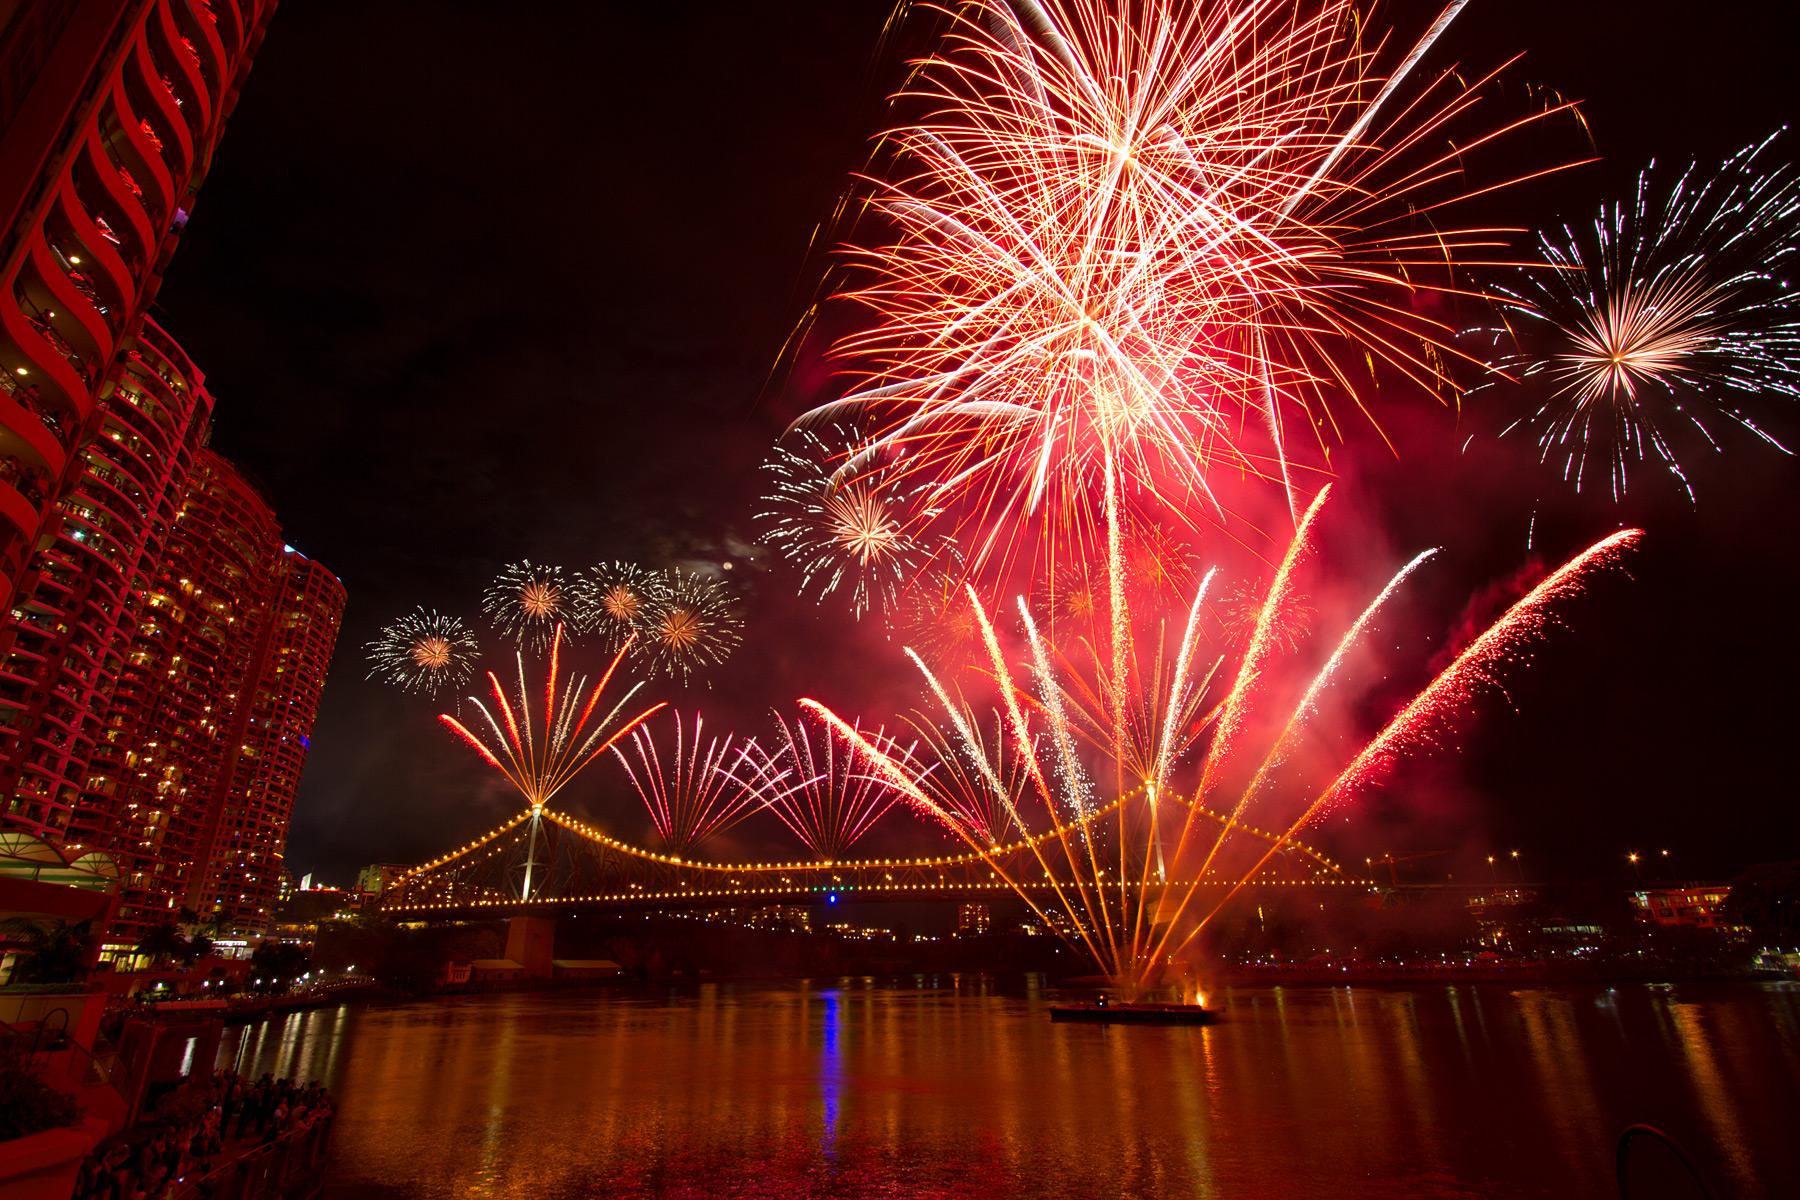 The conclusive Sunsuper Riverfire event at the Brisbane Festival